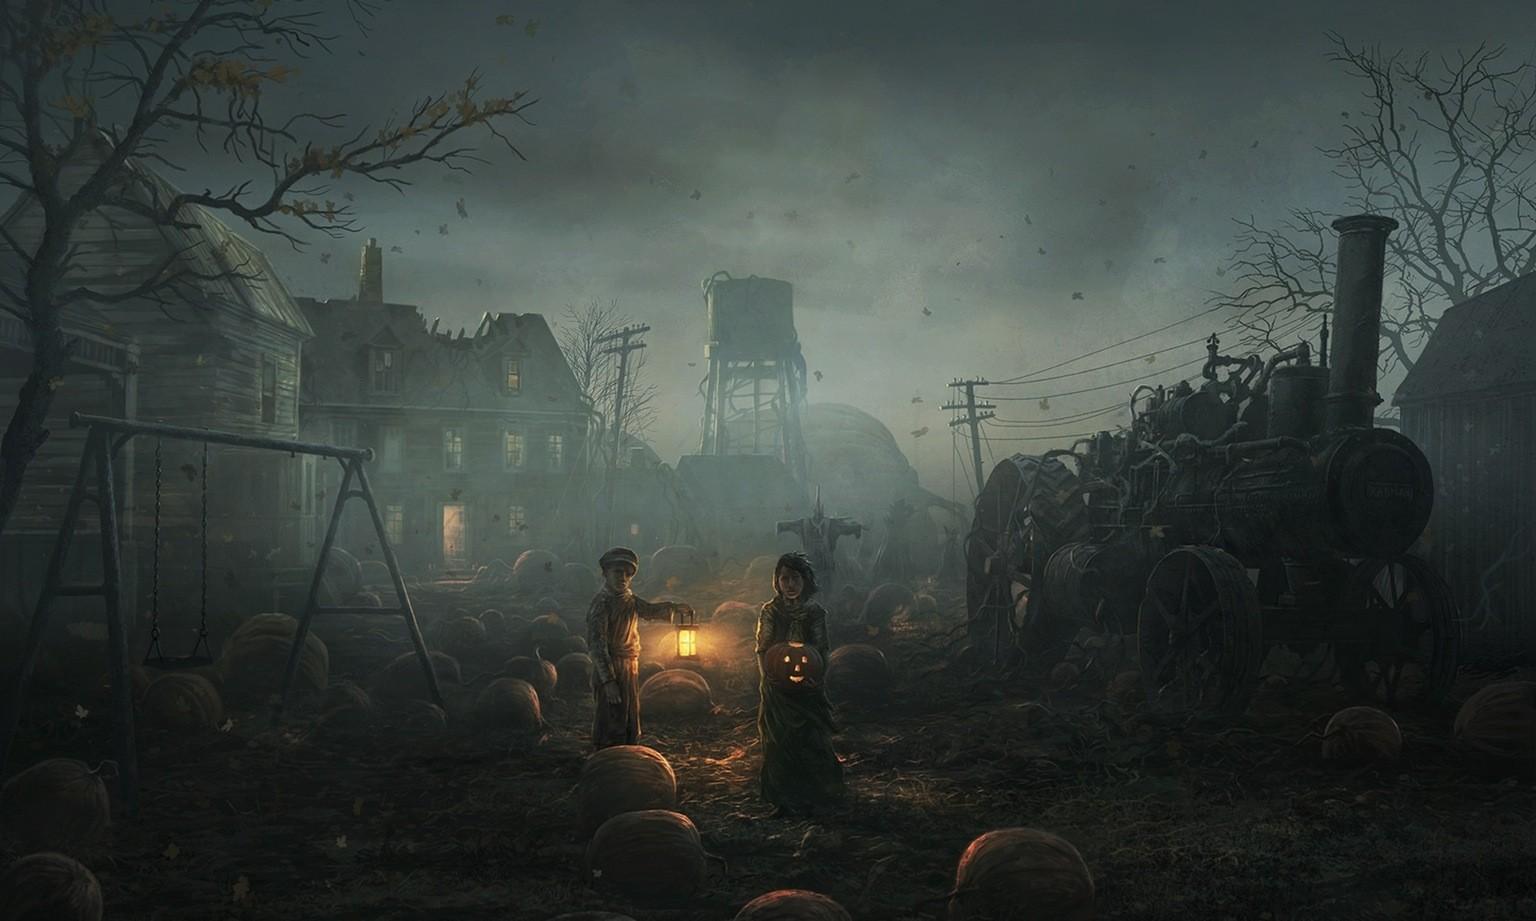 Cool Wallpaper Halloween Spooky - Halloween-spooky-662004  2018_41318.jpg